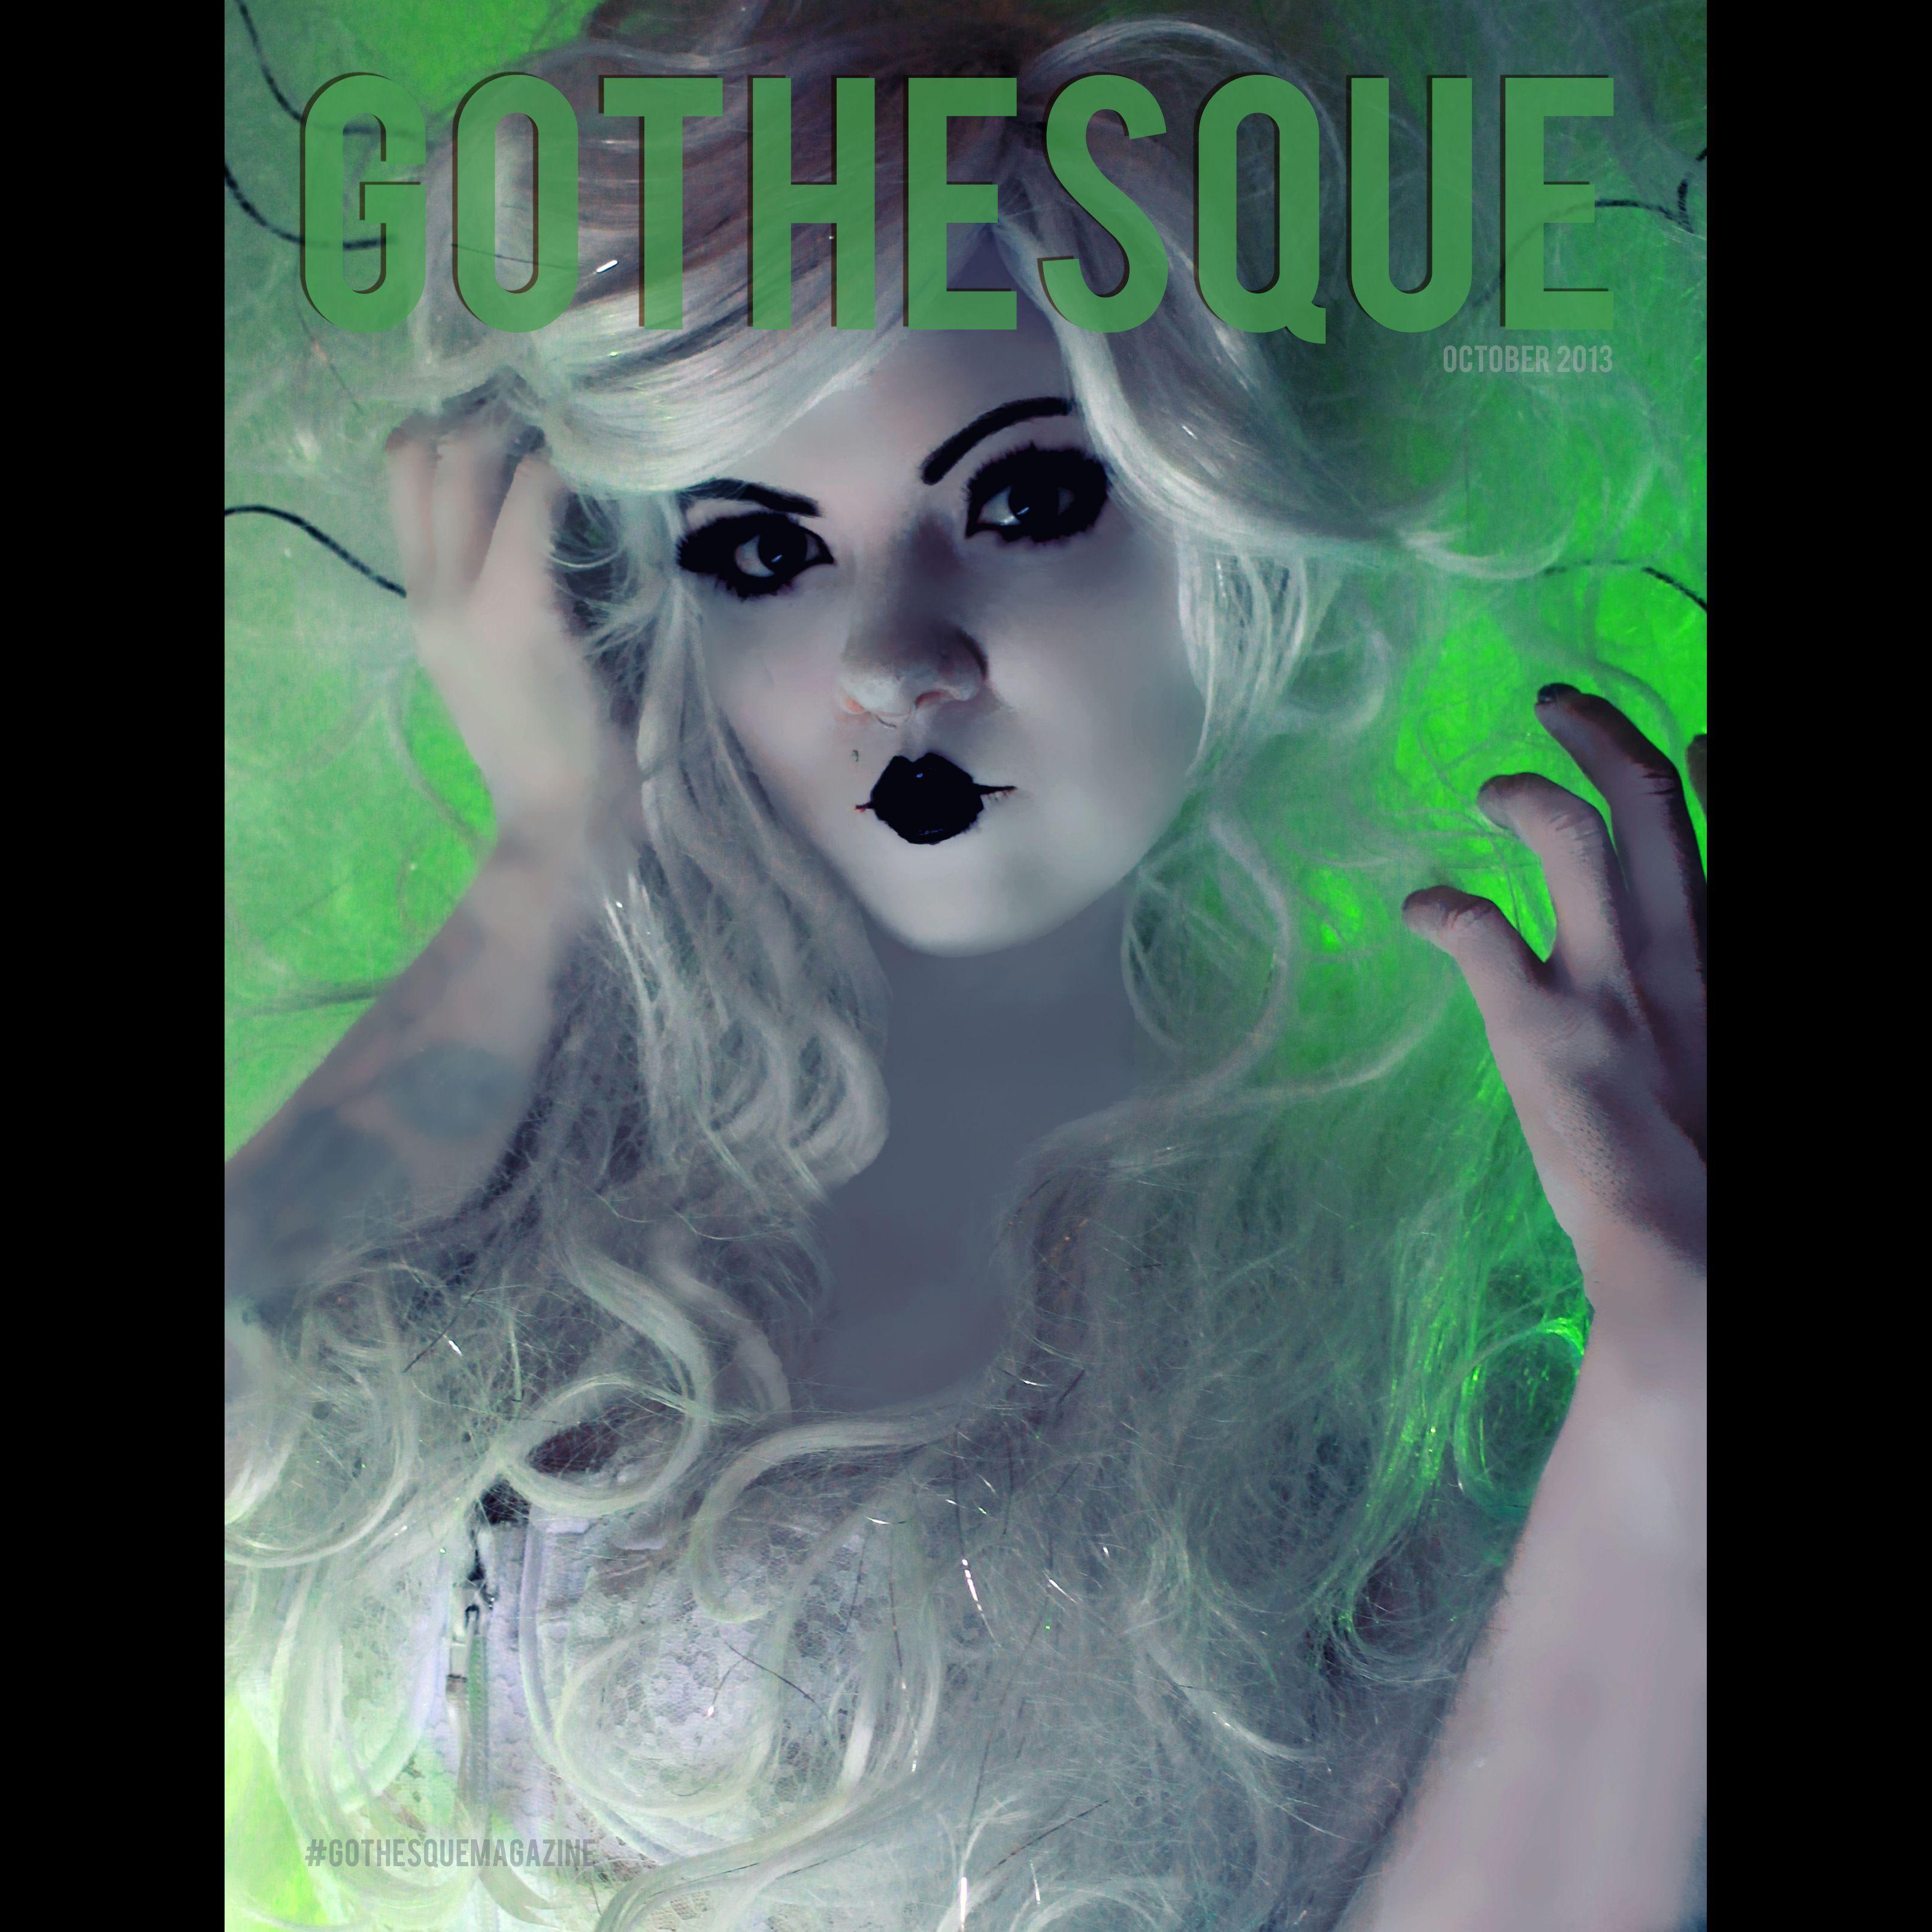 Gothesque